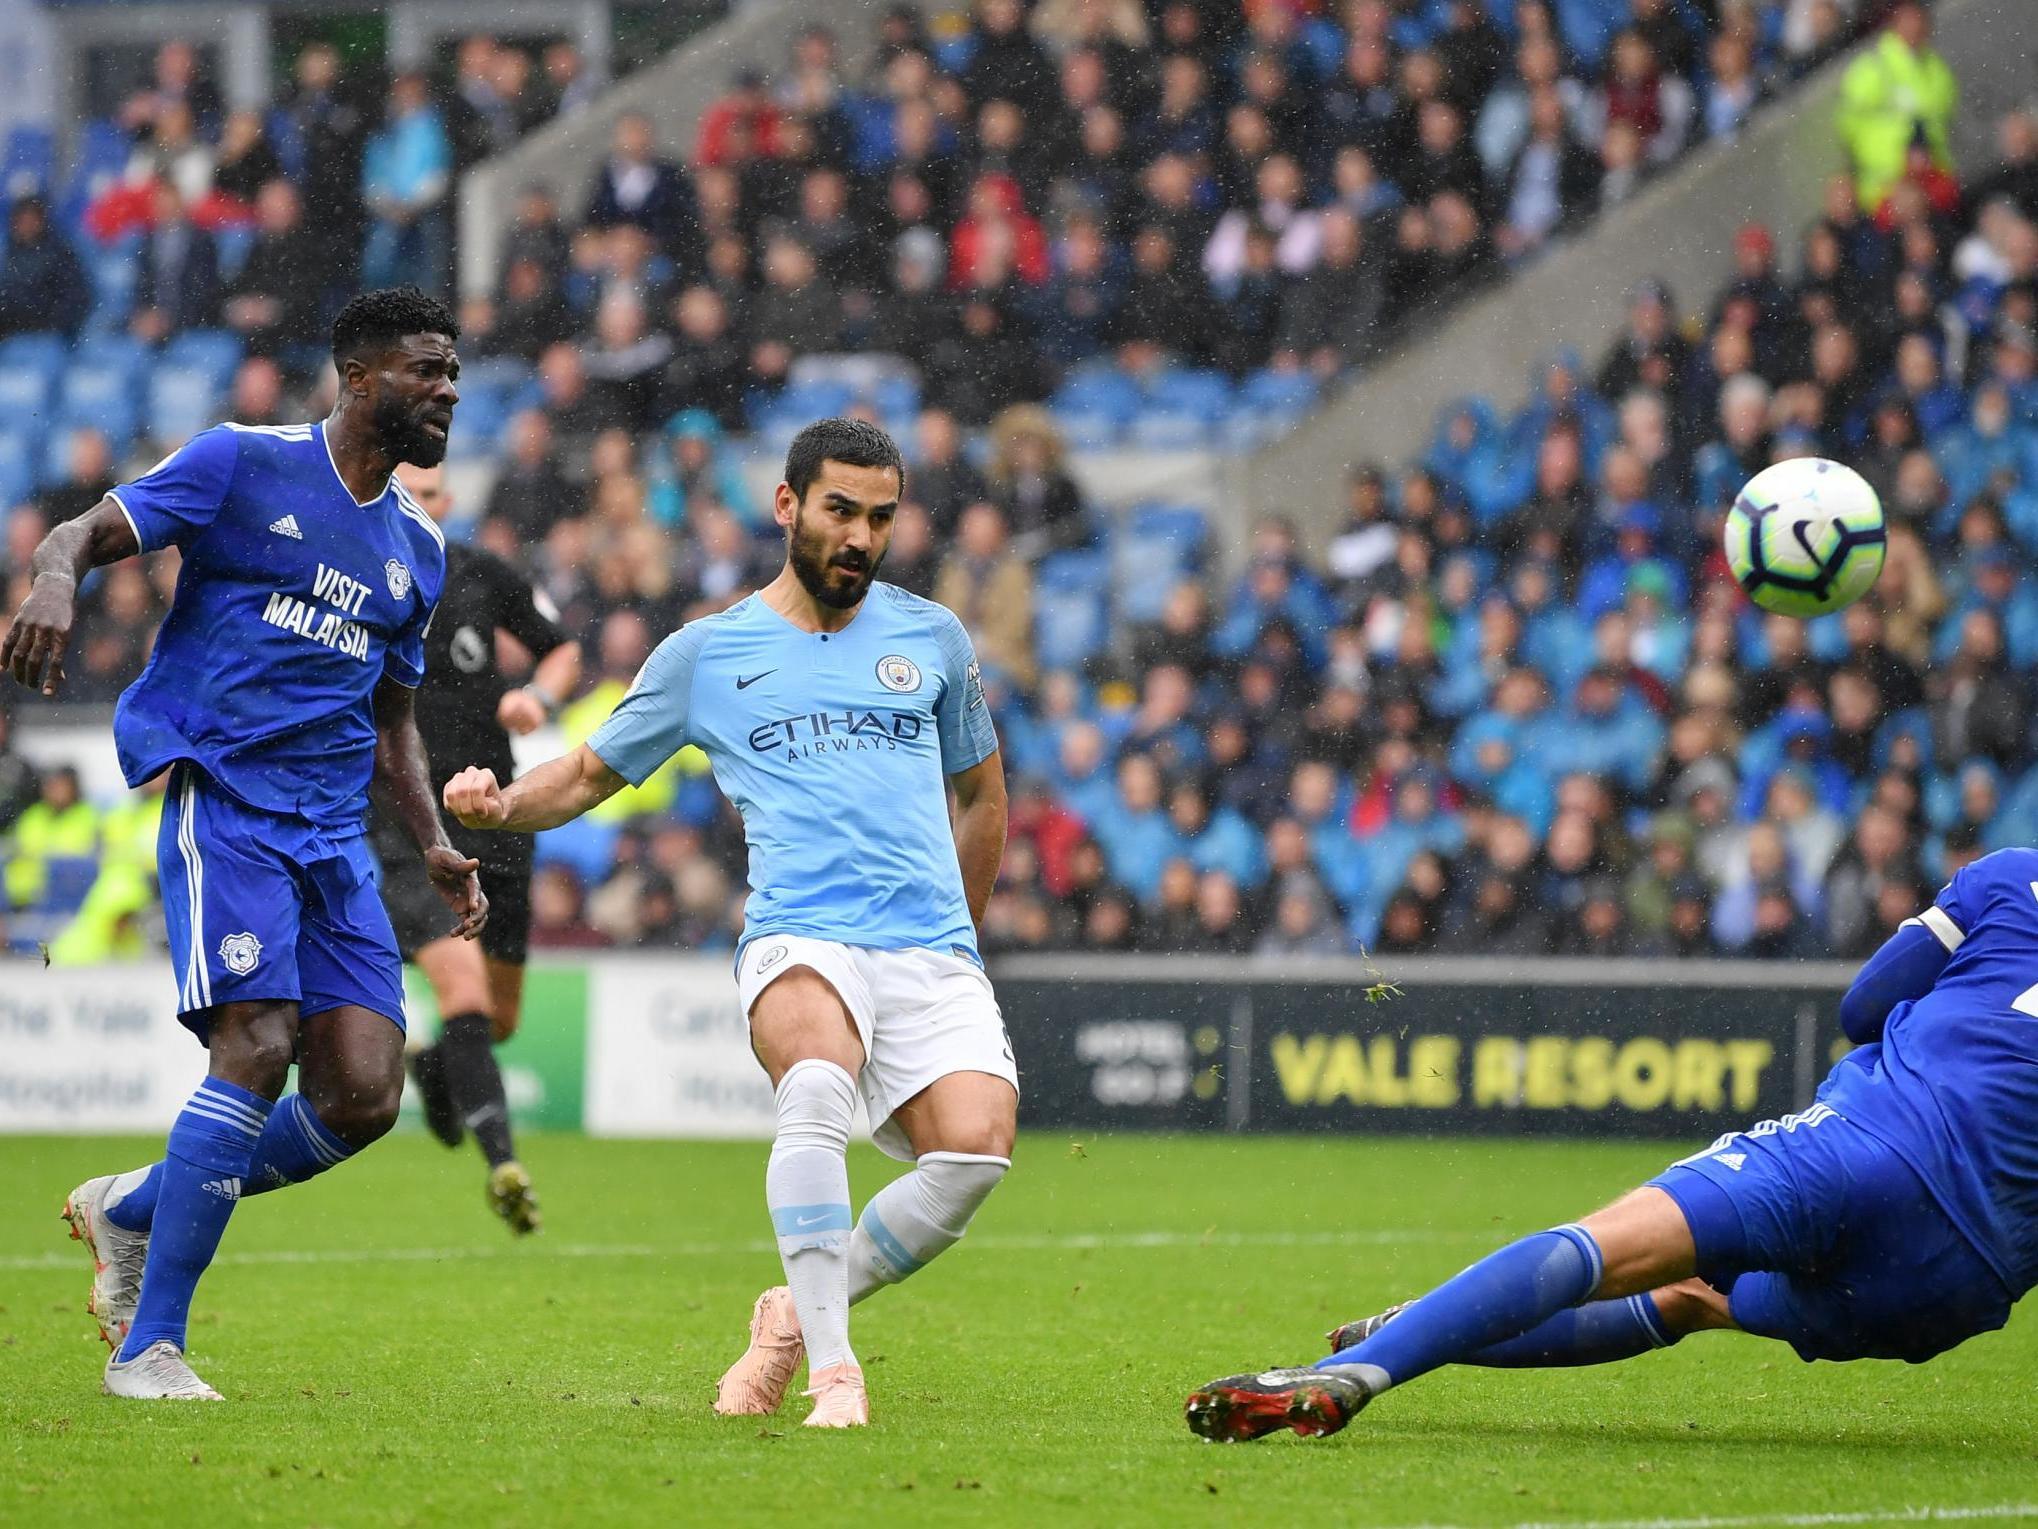 Manchester City relishing prospect of Liverpool test, says Ilkay Gundogan